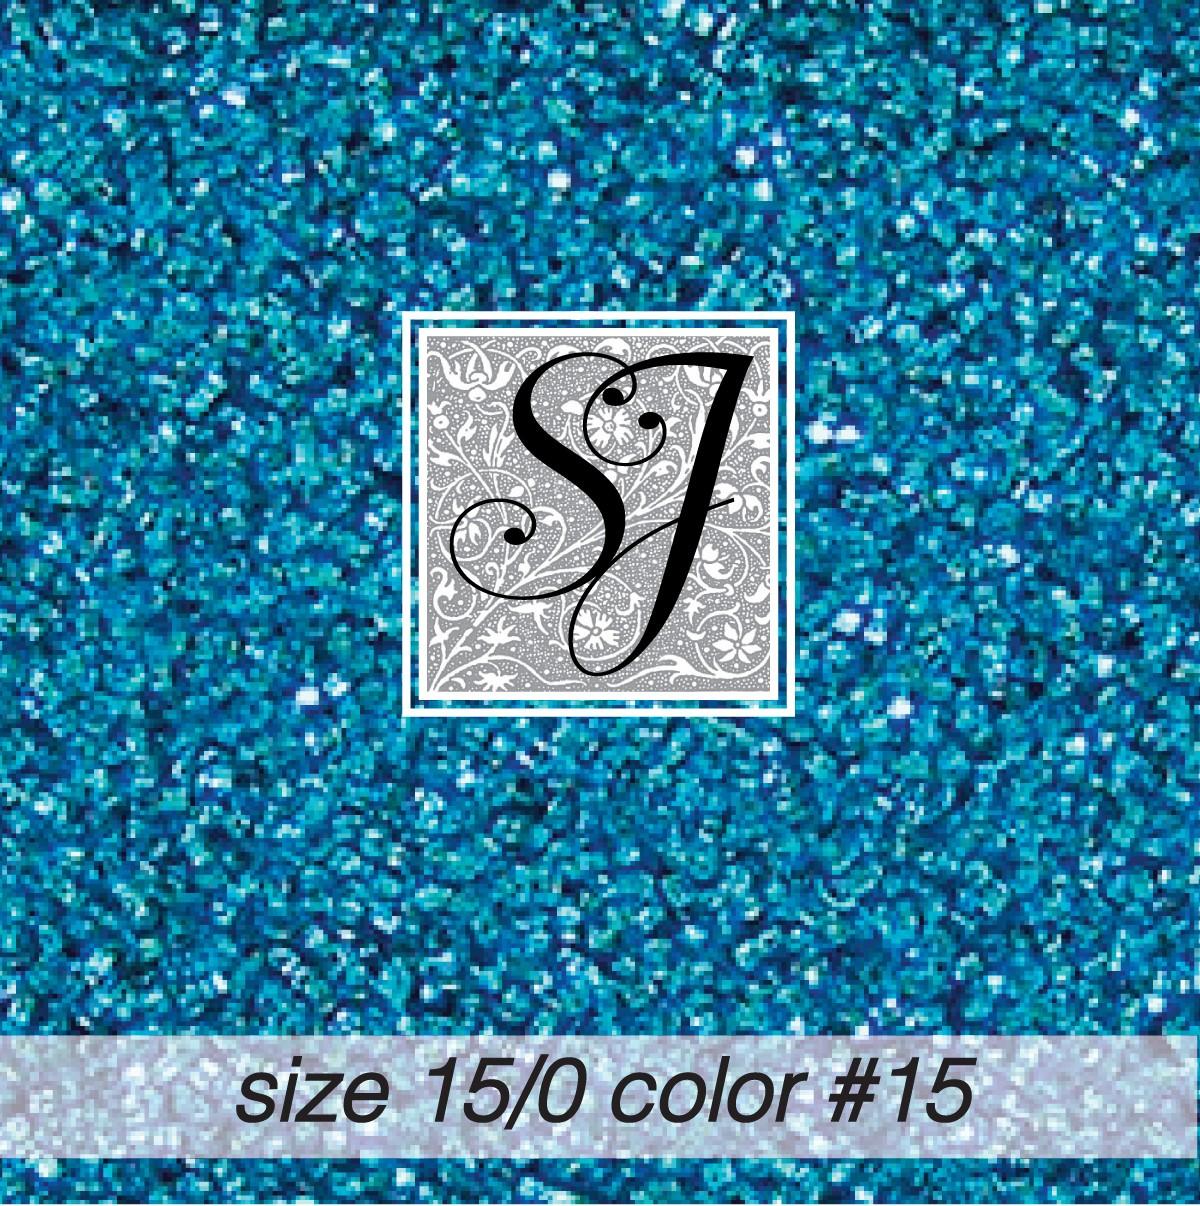 15 Aqua Blue Silver Lined 15/0 Seed Bead